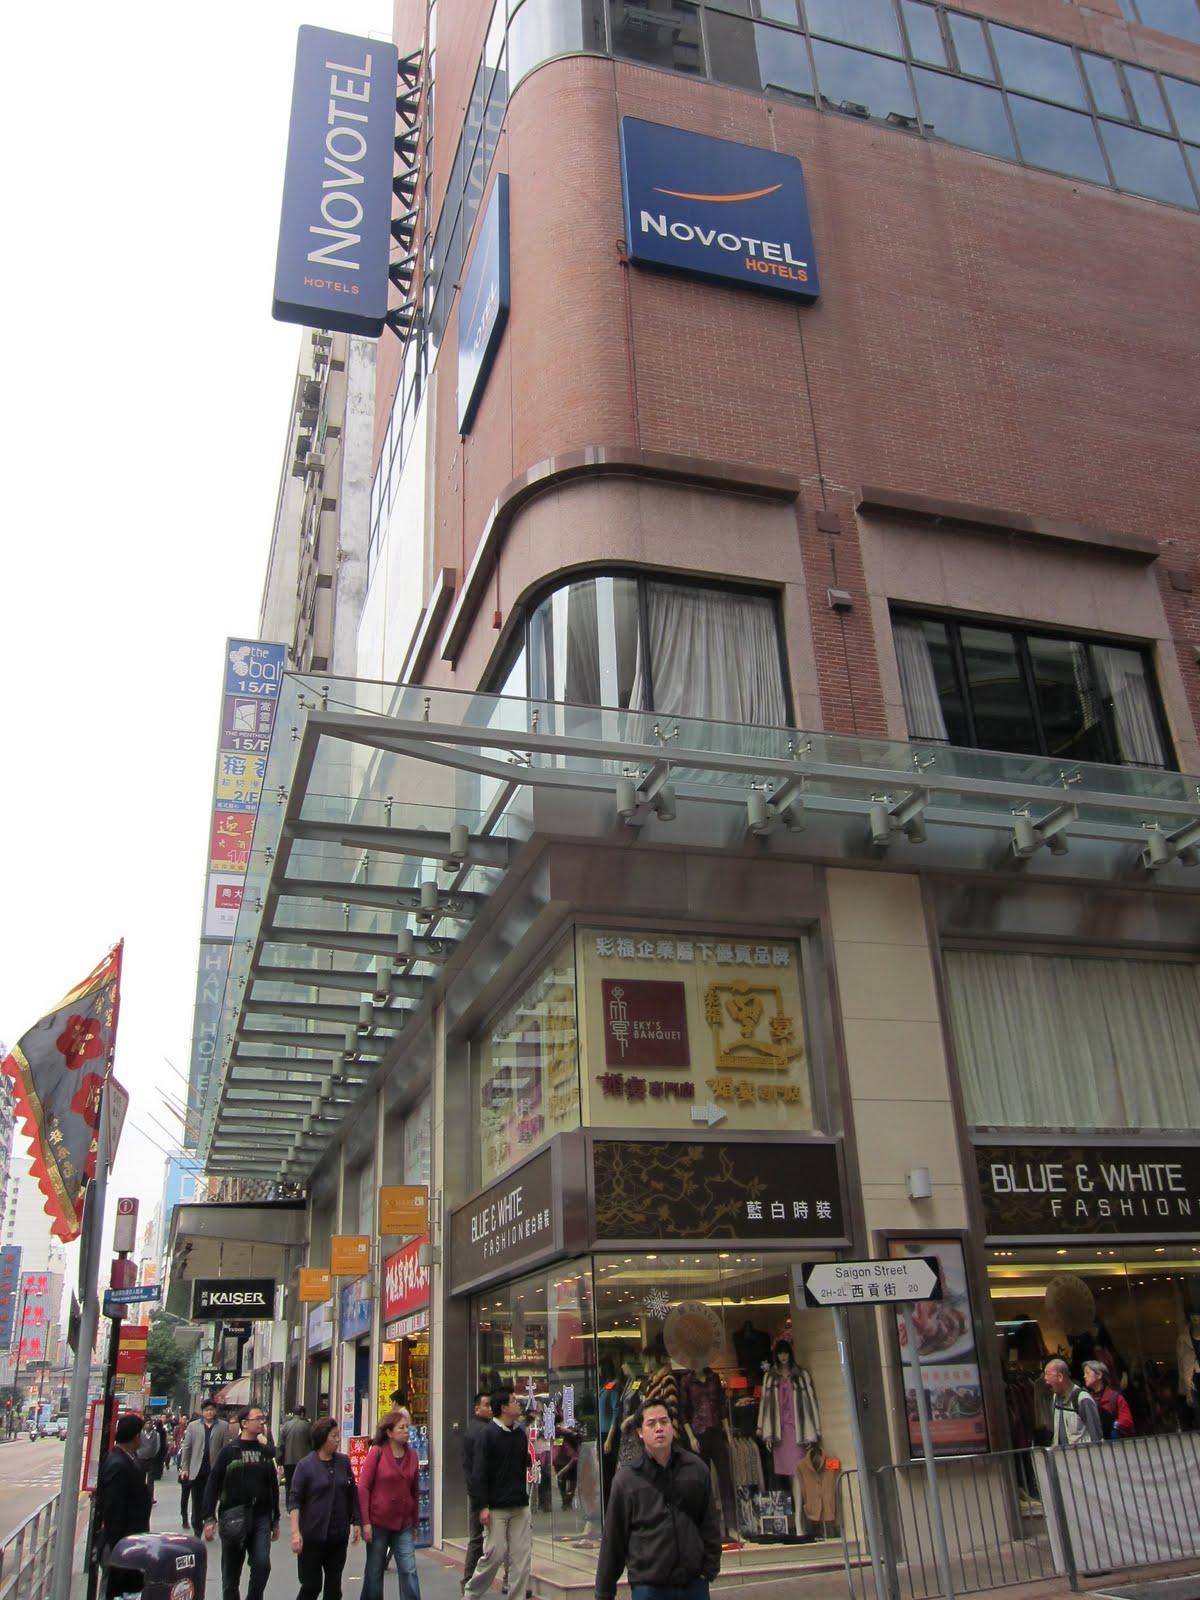 囧園的疼痛人生: Hotel Novotel Hong Kong Nathan Road Kowloon 香港九龍諾富特酒店